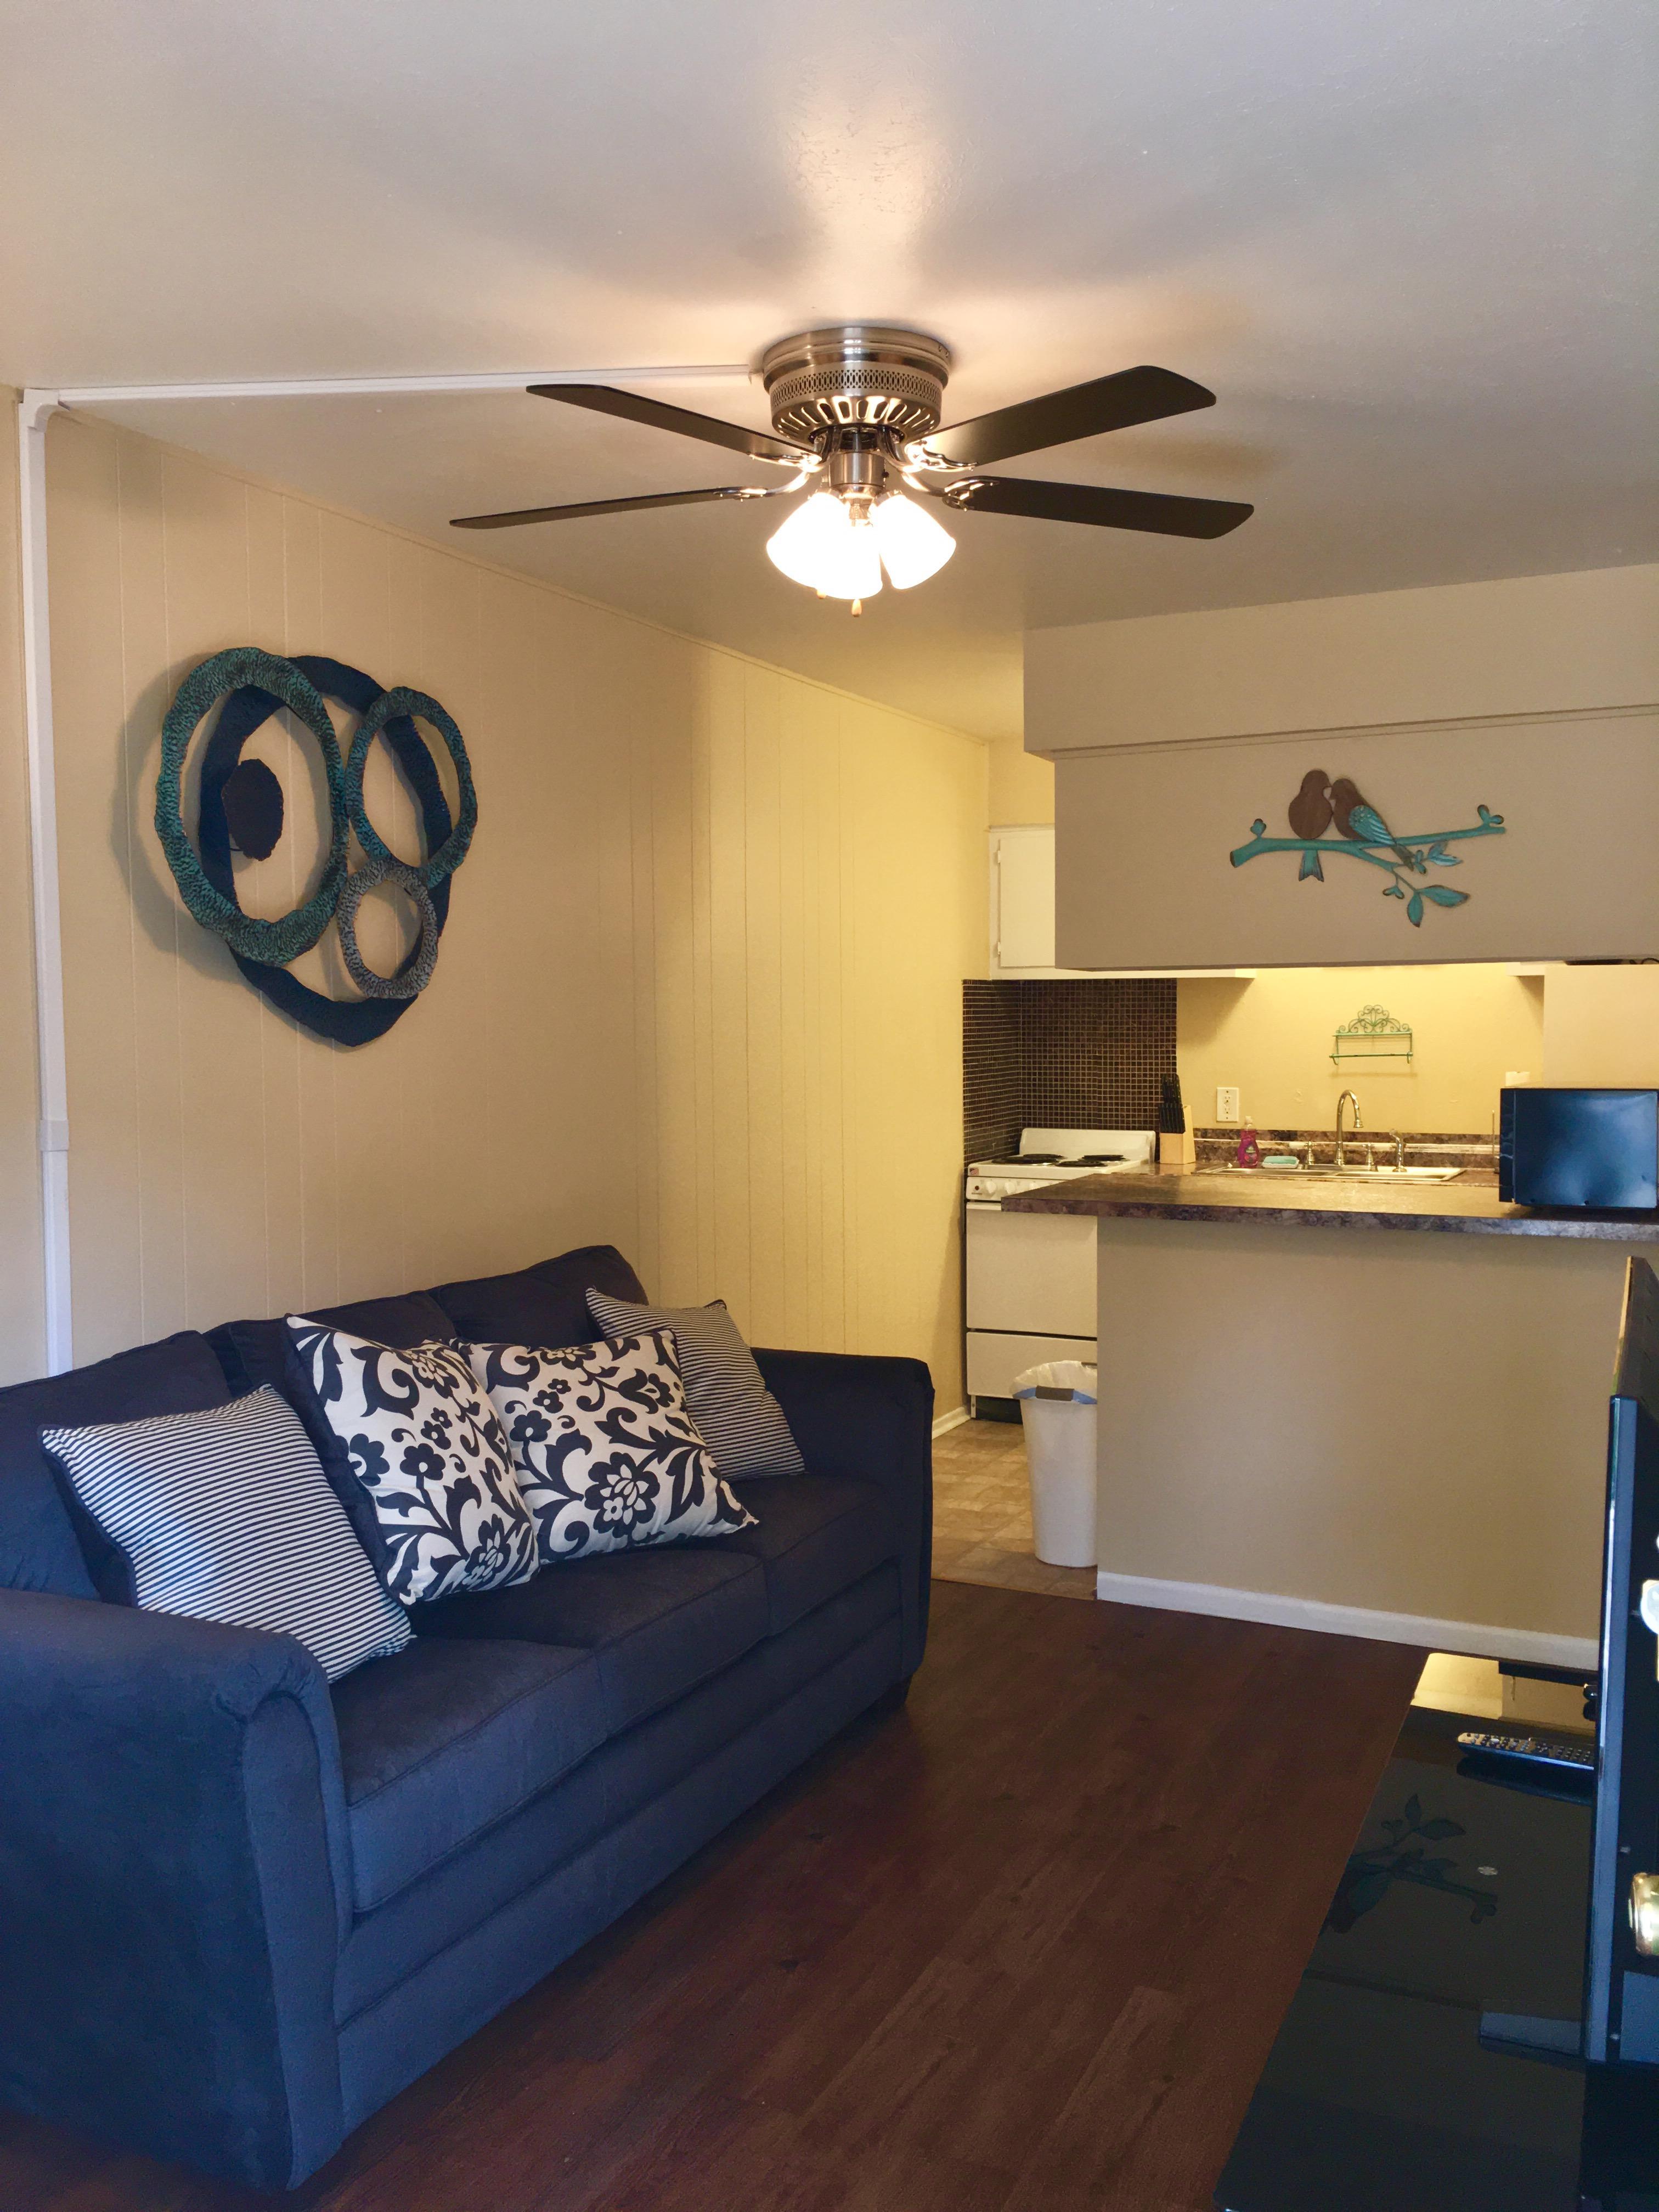 1 Bedroom Apartments Odessa Tx.High Plains Apartment Homes 3727 ...